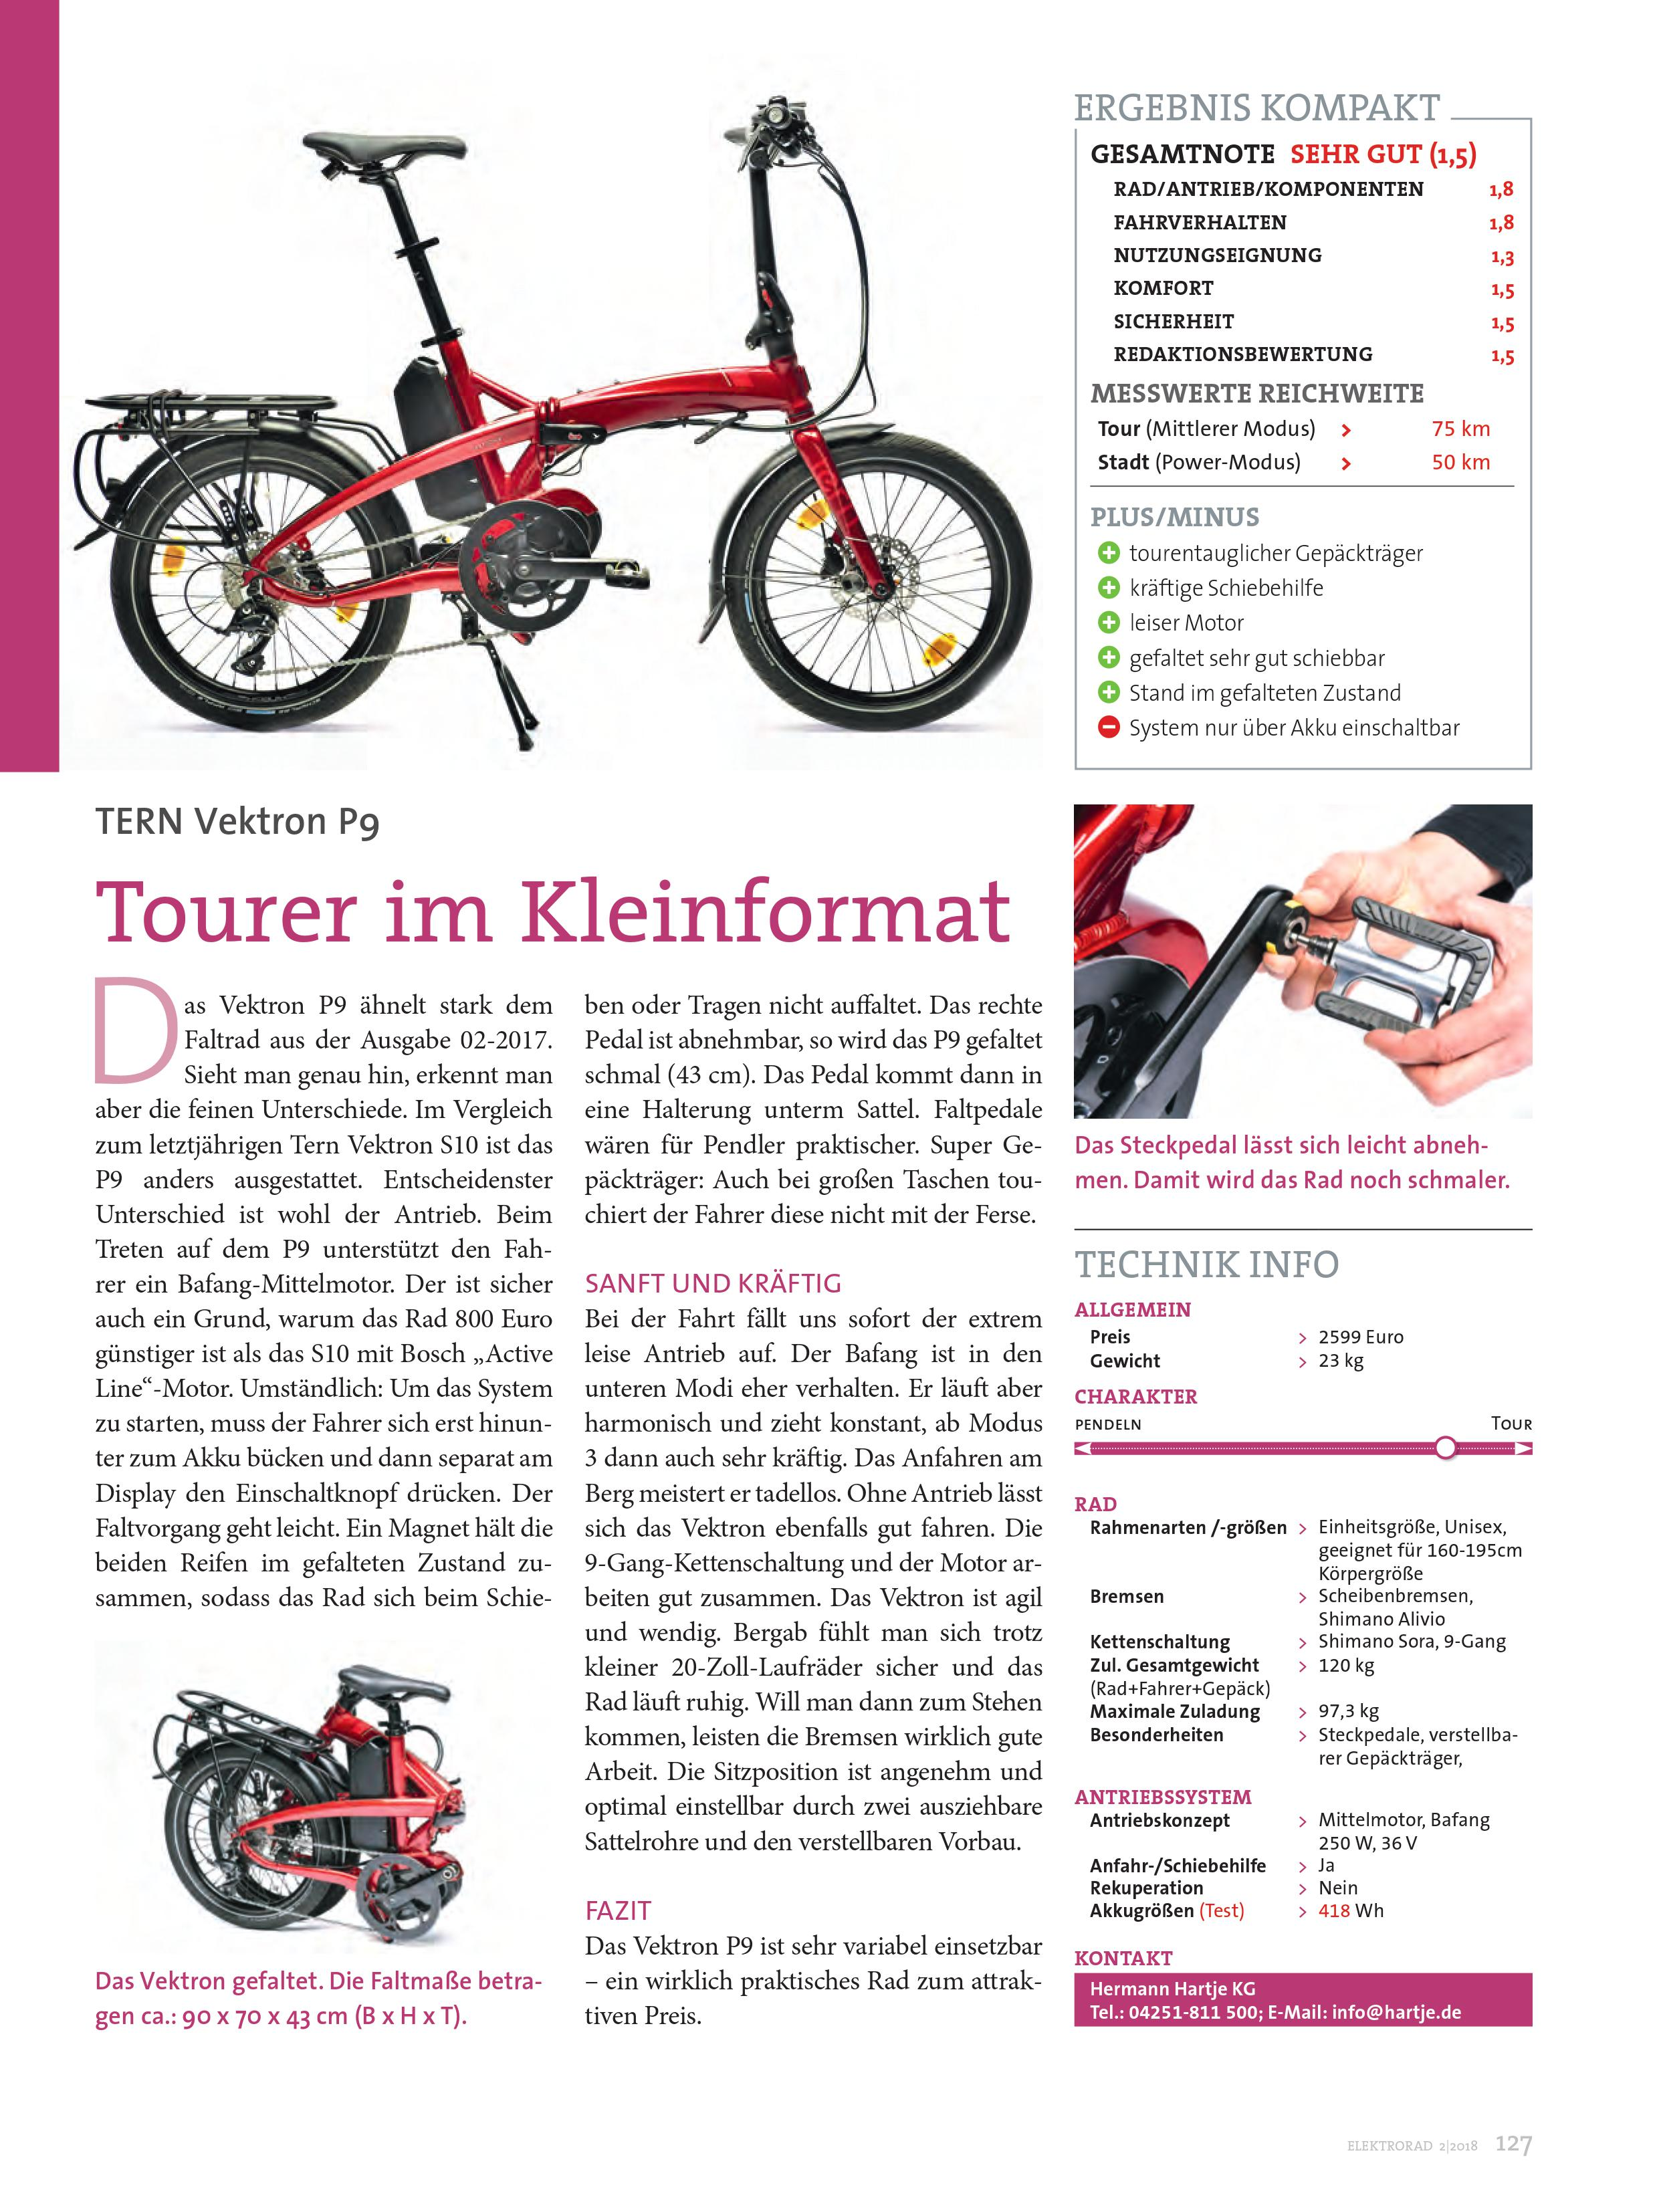 Tern Vektron P9 Tern Folding Bikes United Kingdom